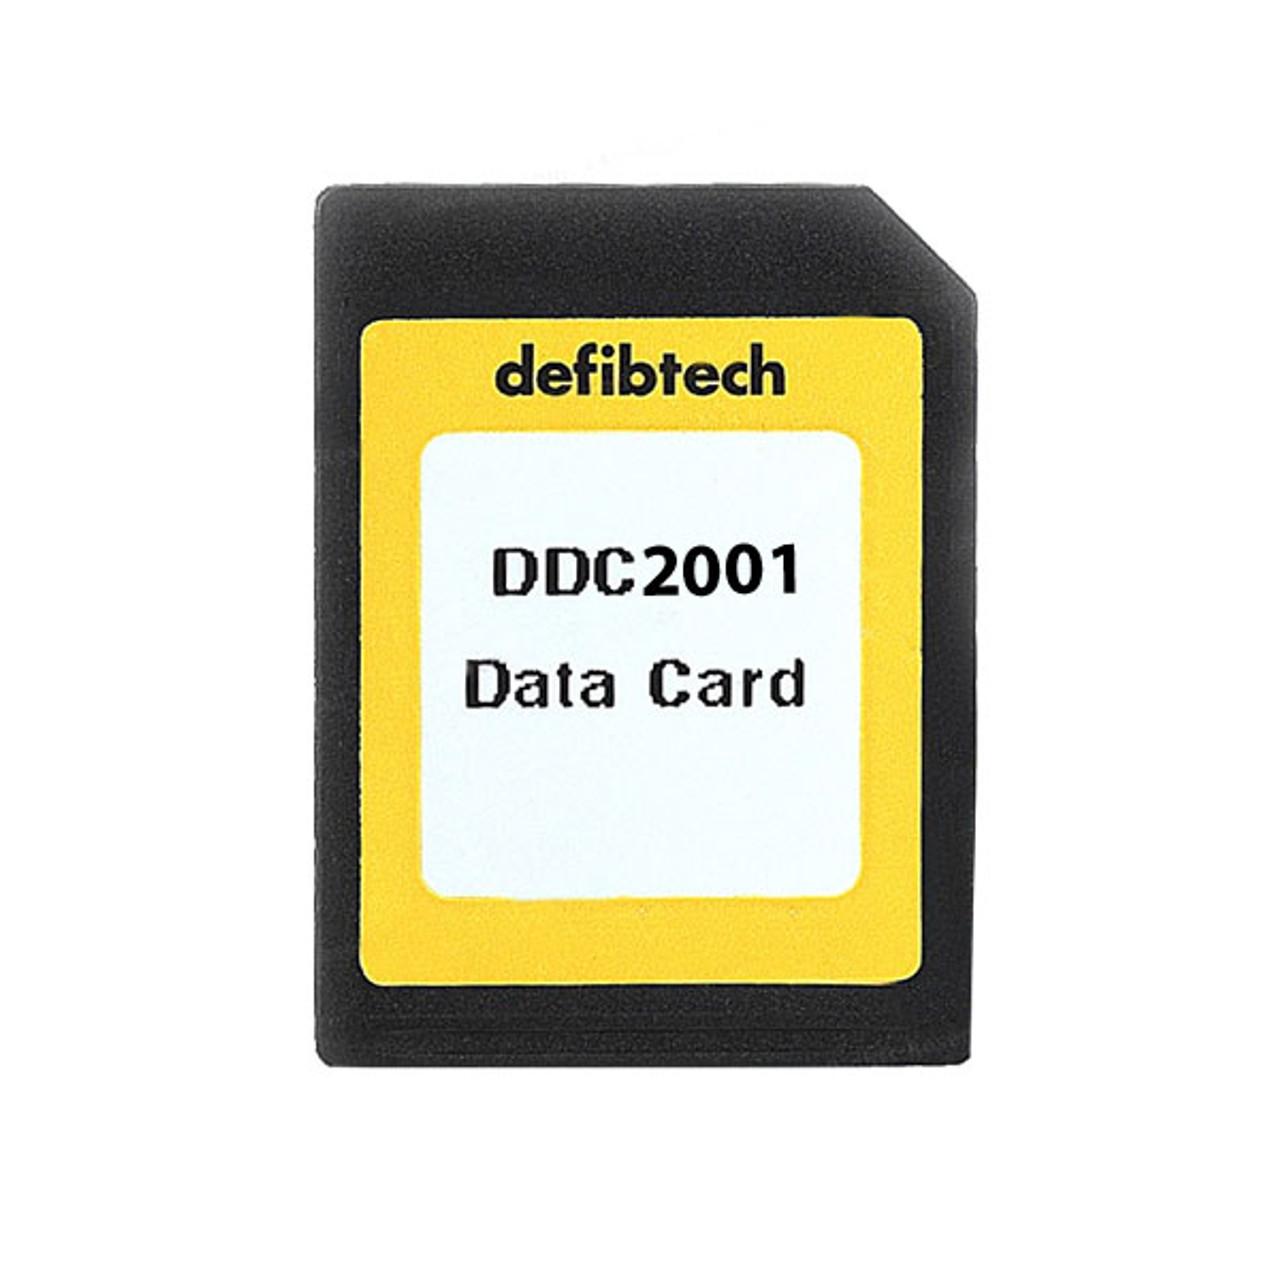 Defibtech VIEW Data Card